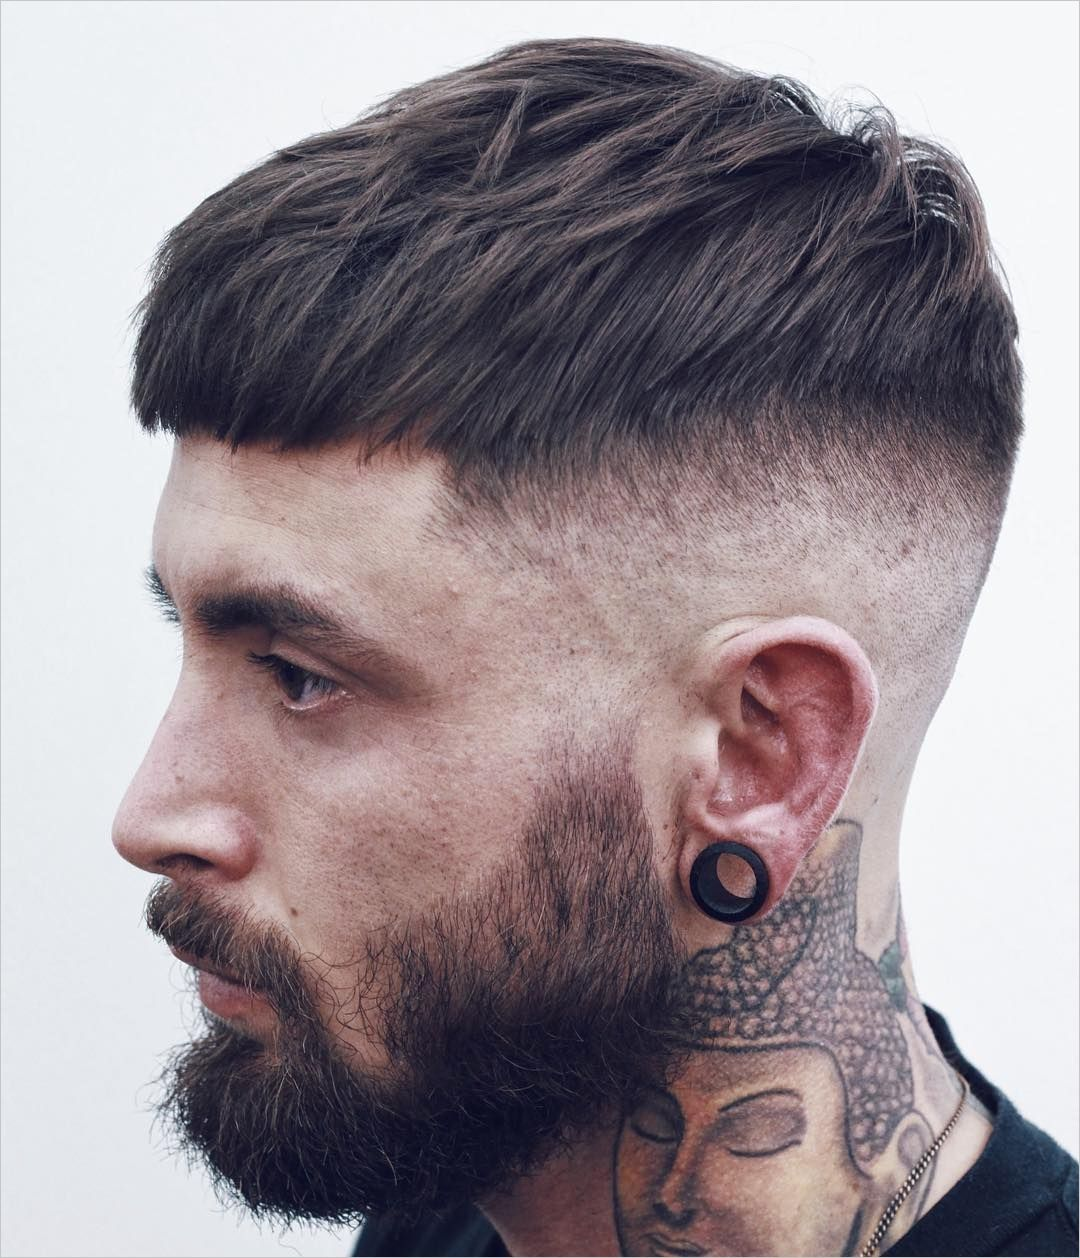 12+ Kurzhaarfrisuren Herren (Update 1212)  Frisuren kurz